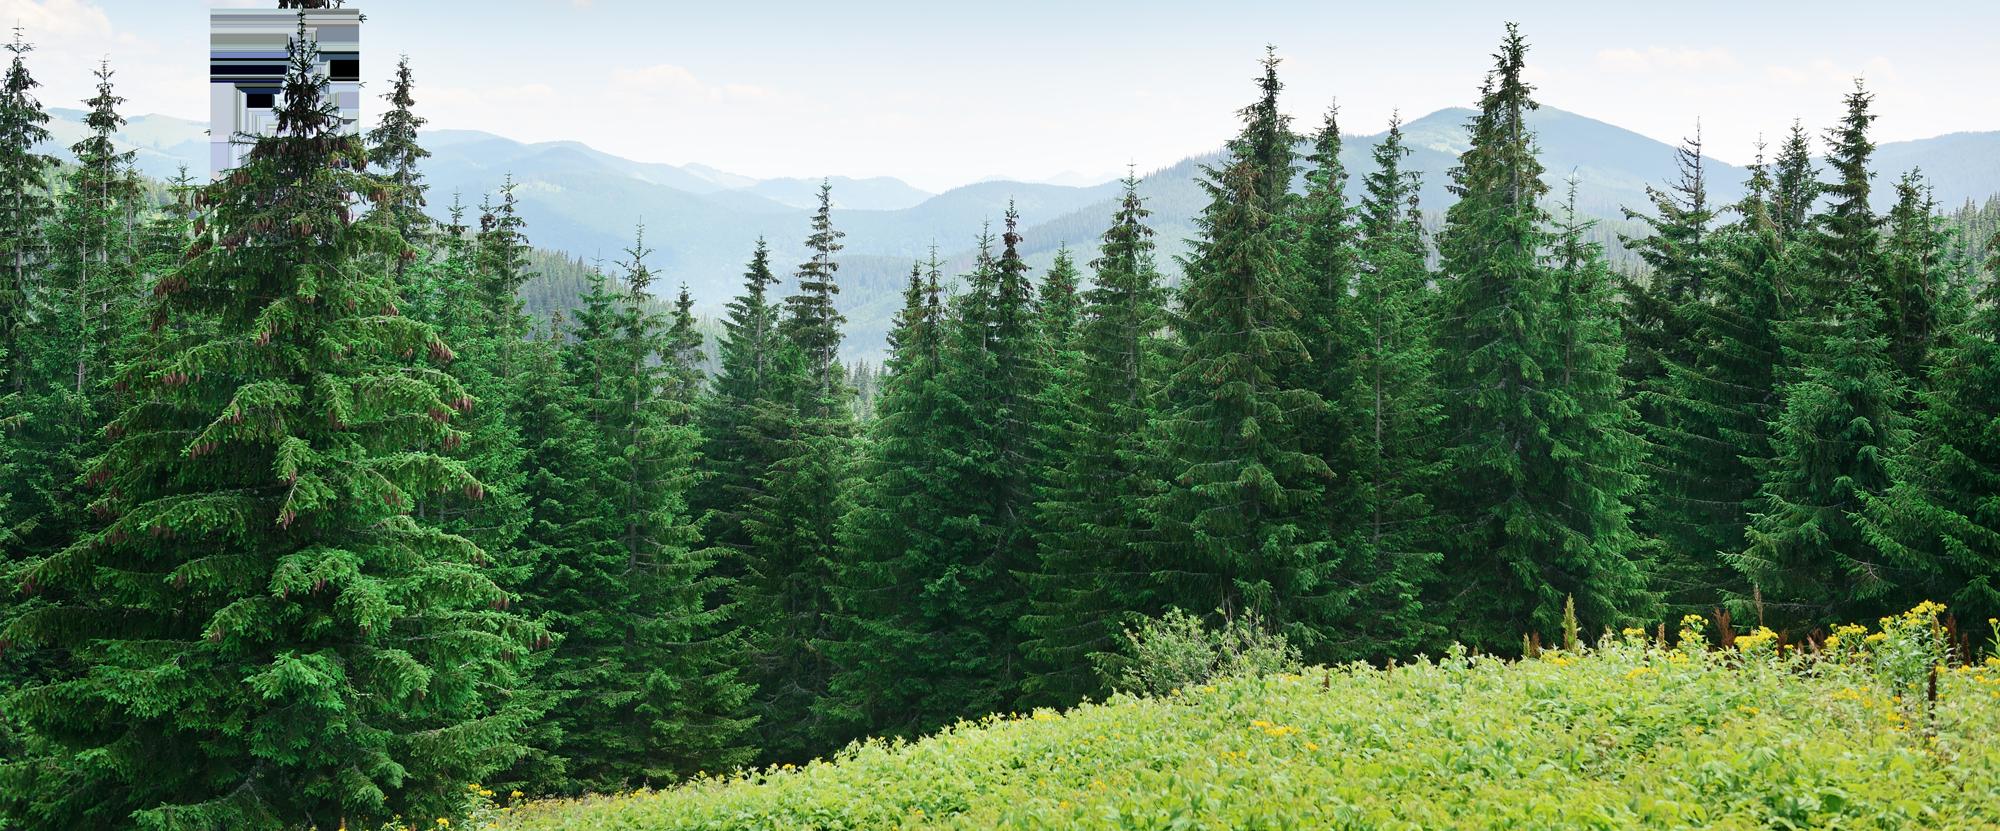 Forest PNG Images Transparent Free Download.